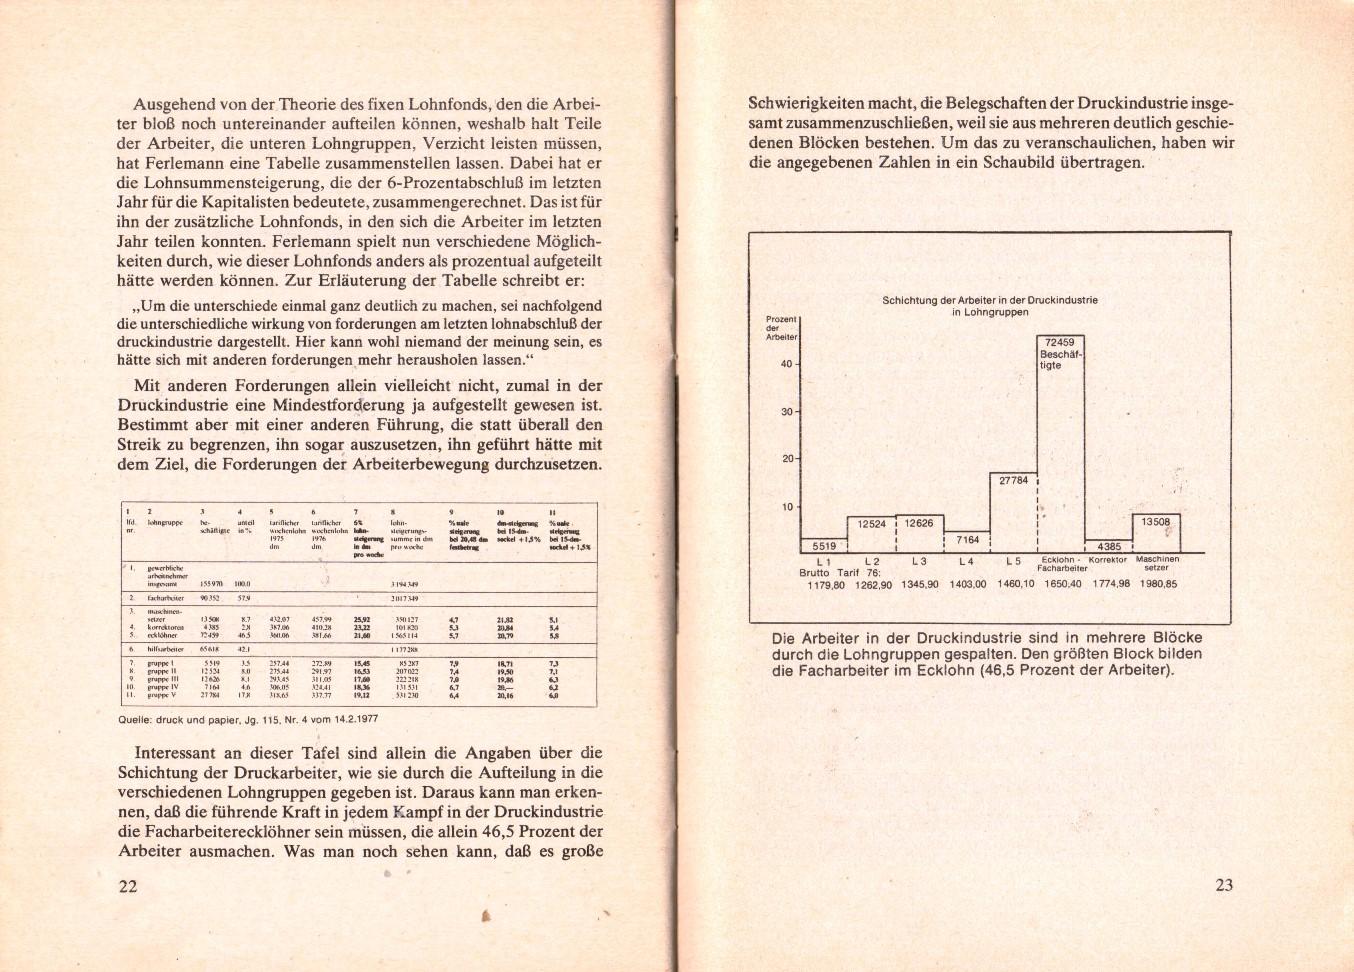 KBW_1977_D_Mark_oder_Prozente_13